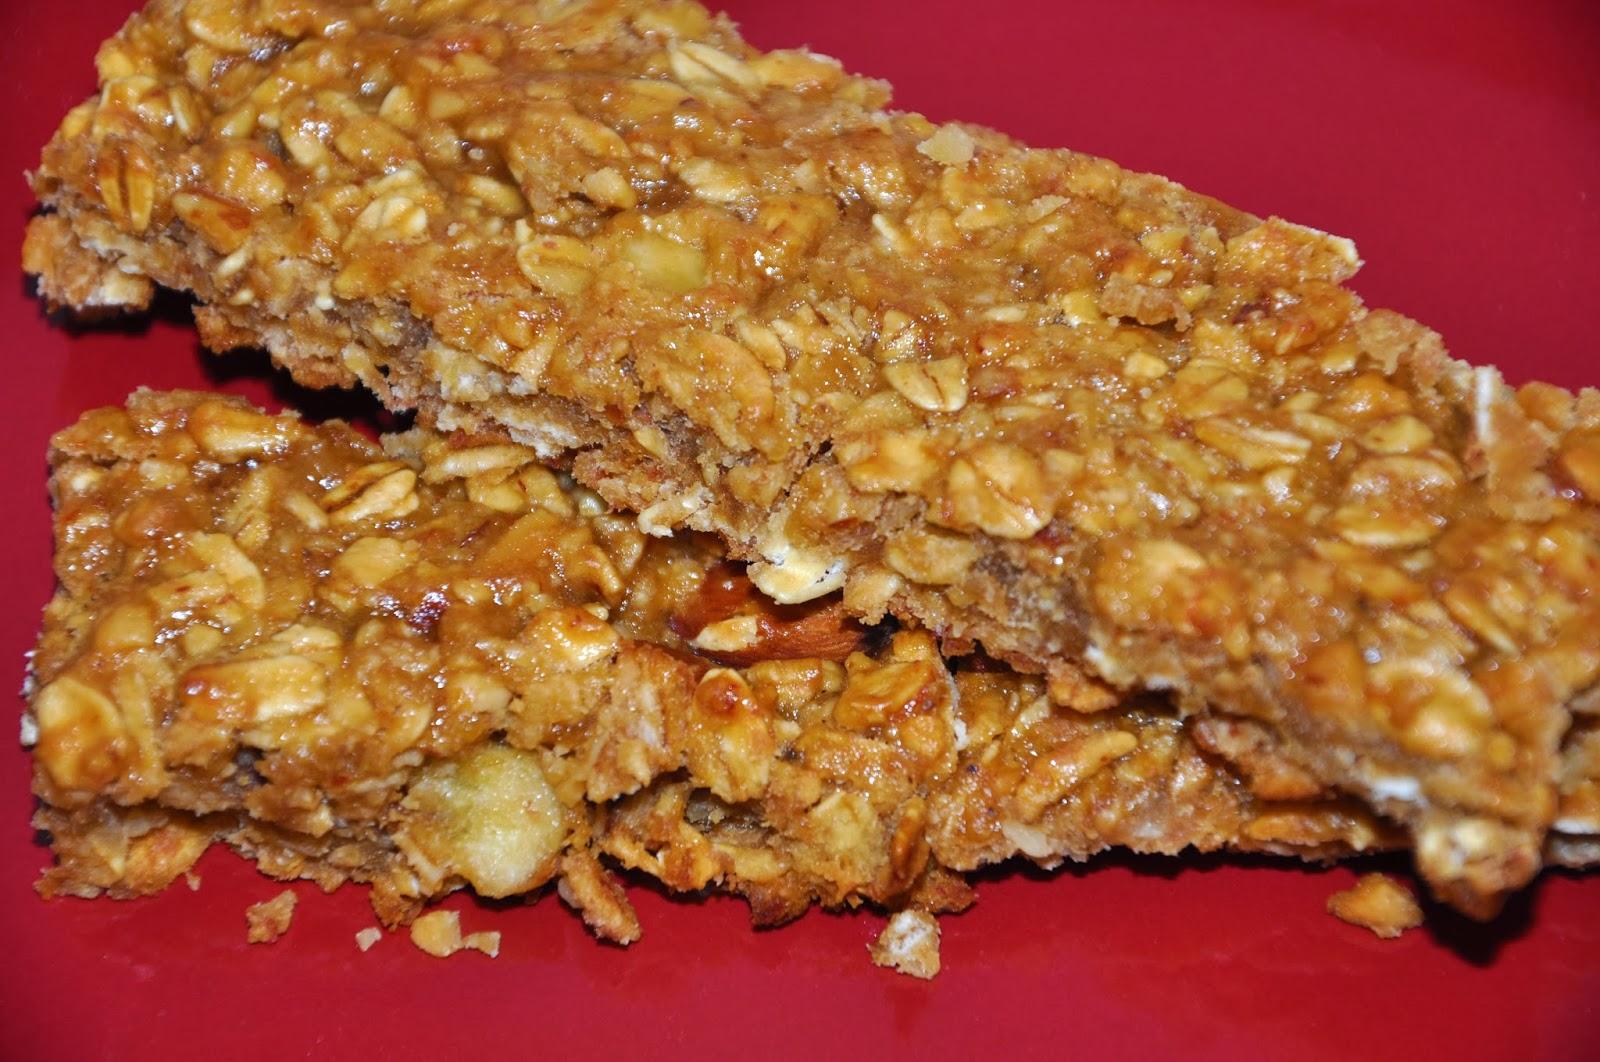 Great Blender Recipes: Banana Nut Crunch Granola Bar